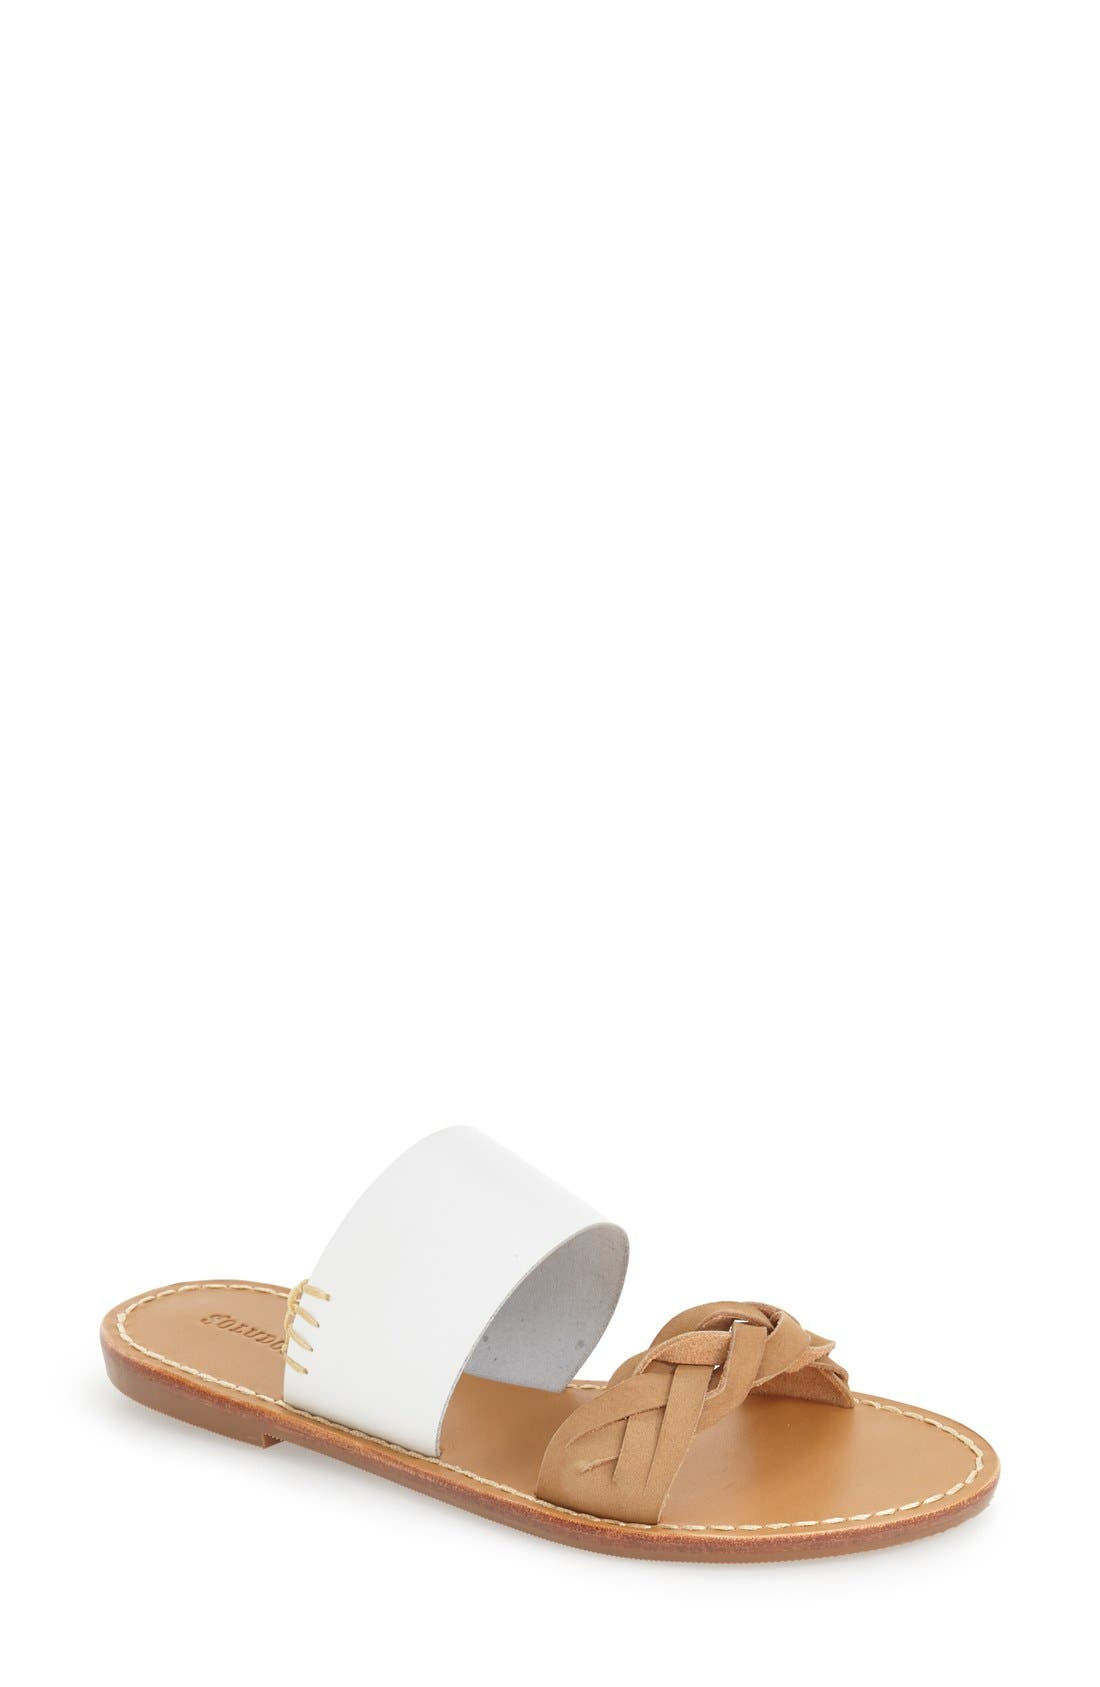 Main Image - Soludos Slide Sandal (Women)